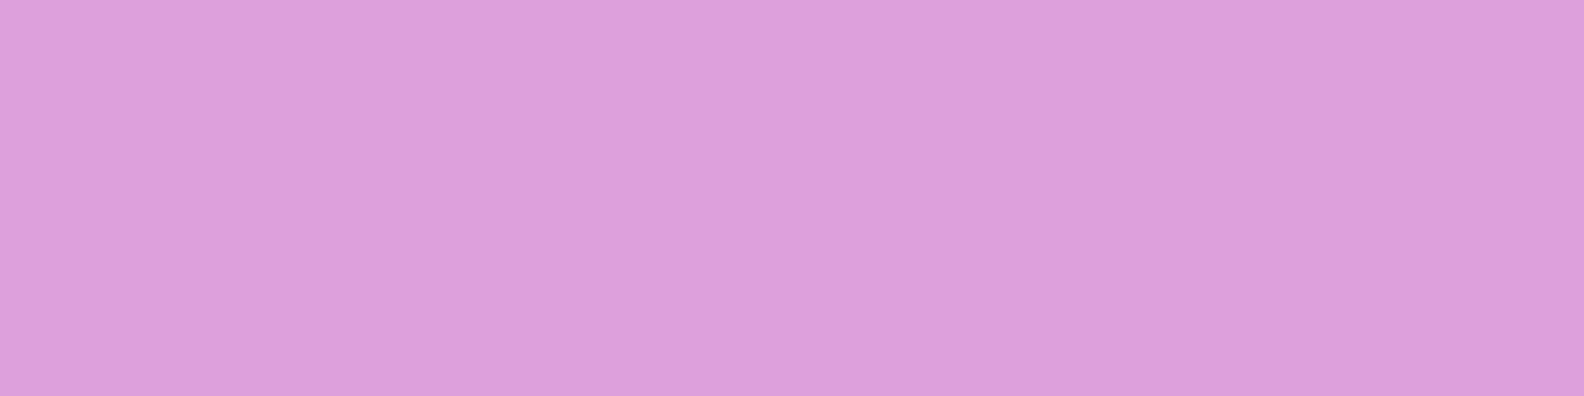 1584x396 Medium Lavender Magenta Solid Color Background